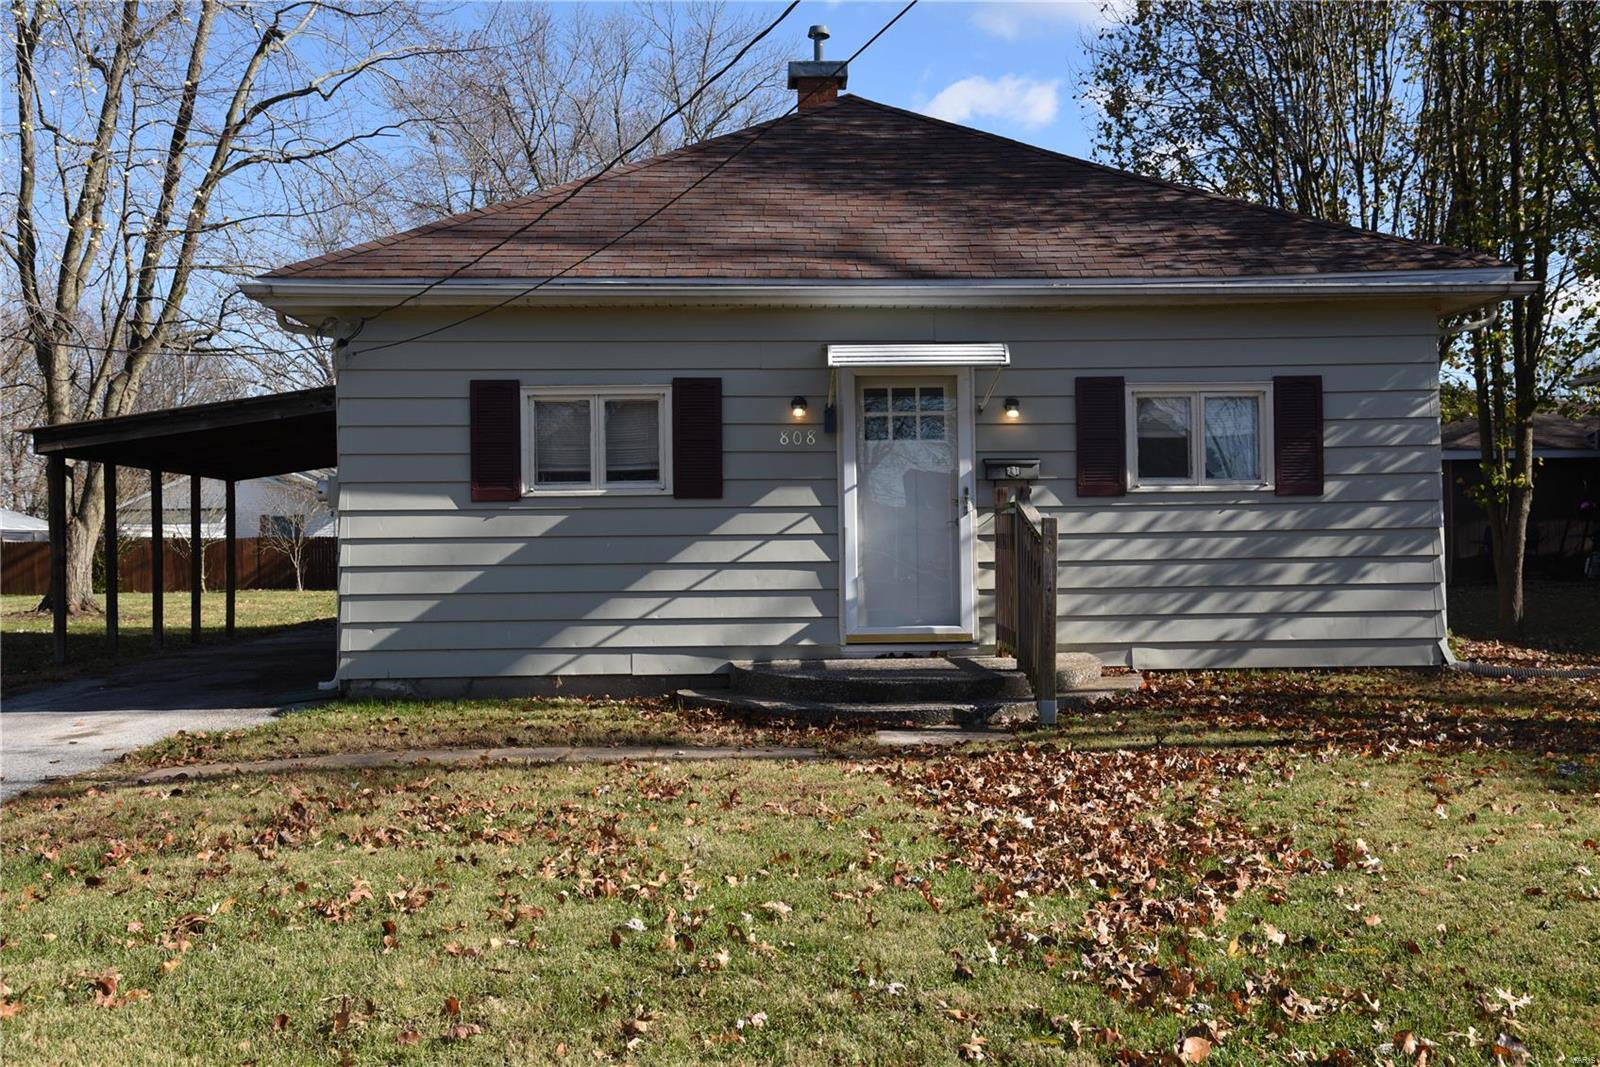 808 N Franklin Property Photo - Staunton, IL real estate listing